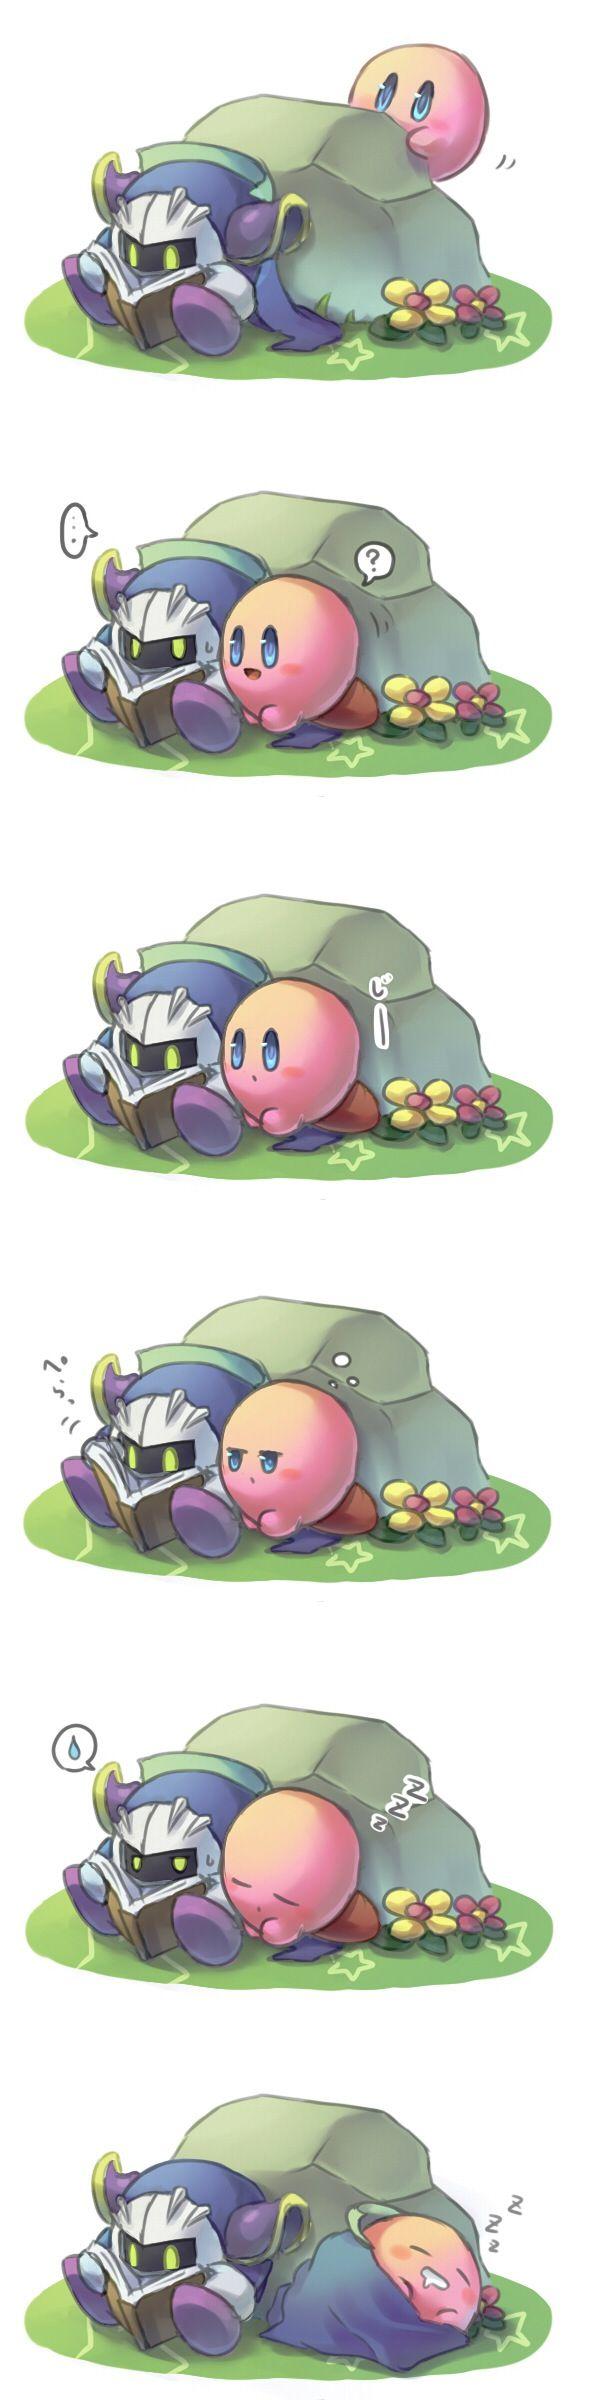 Kirby and Meta Knight | Kirby | Pinterest